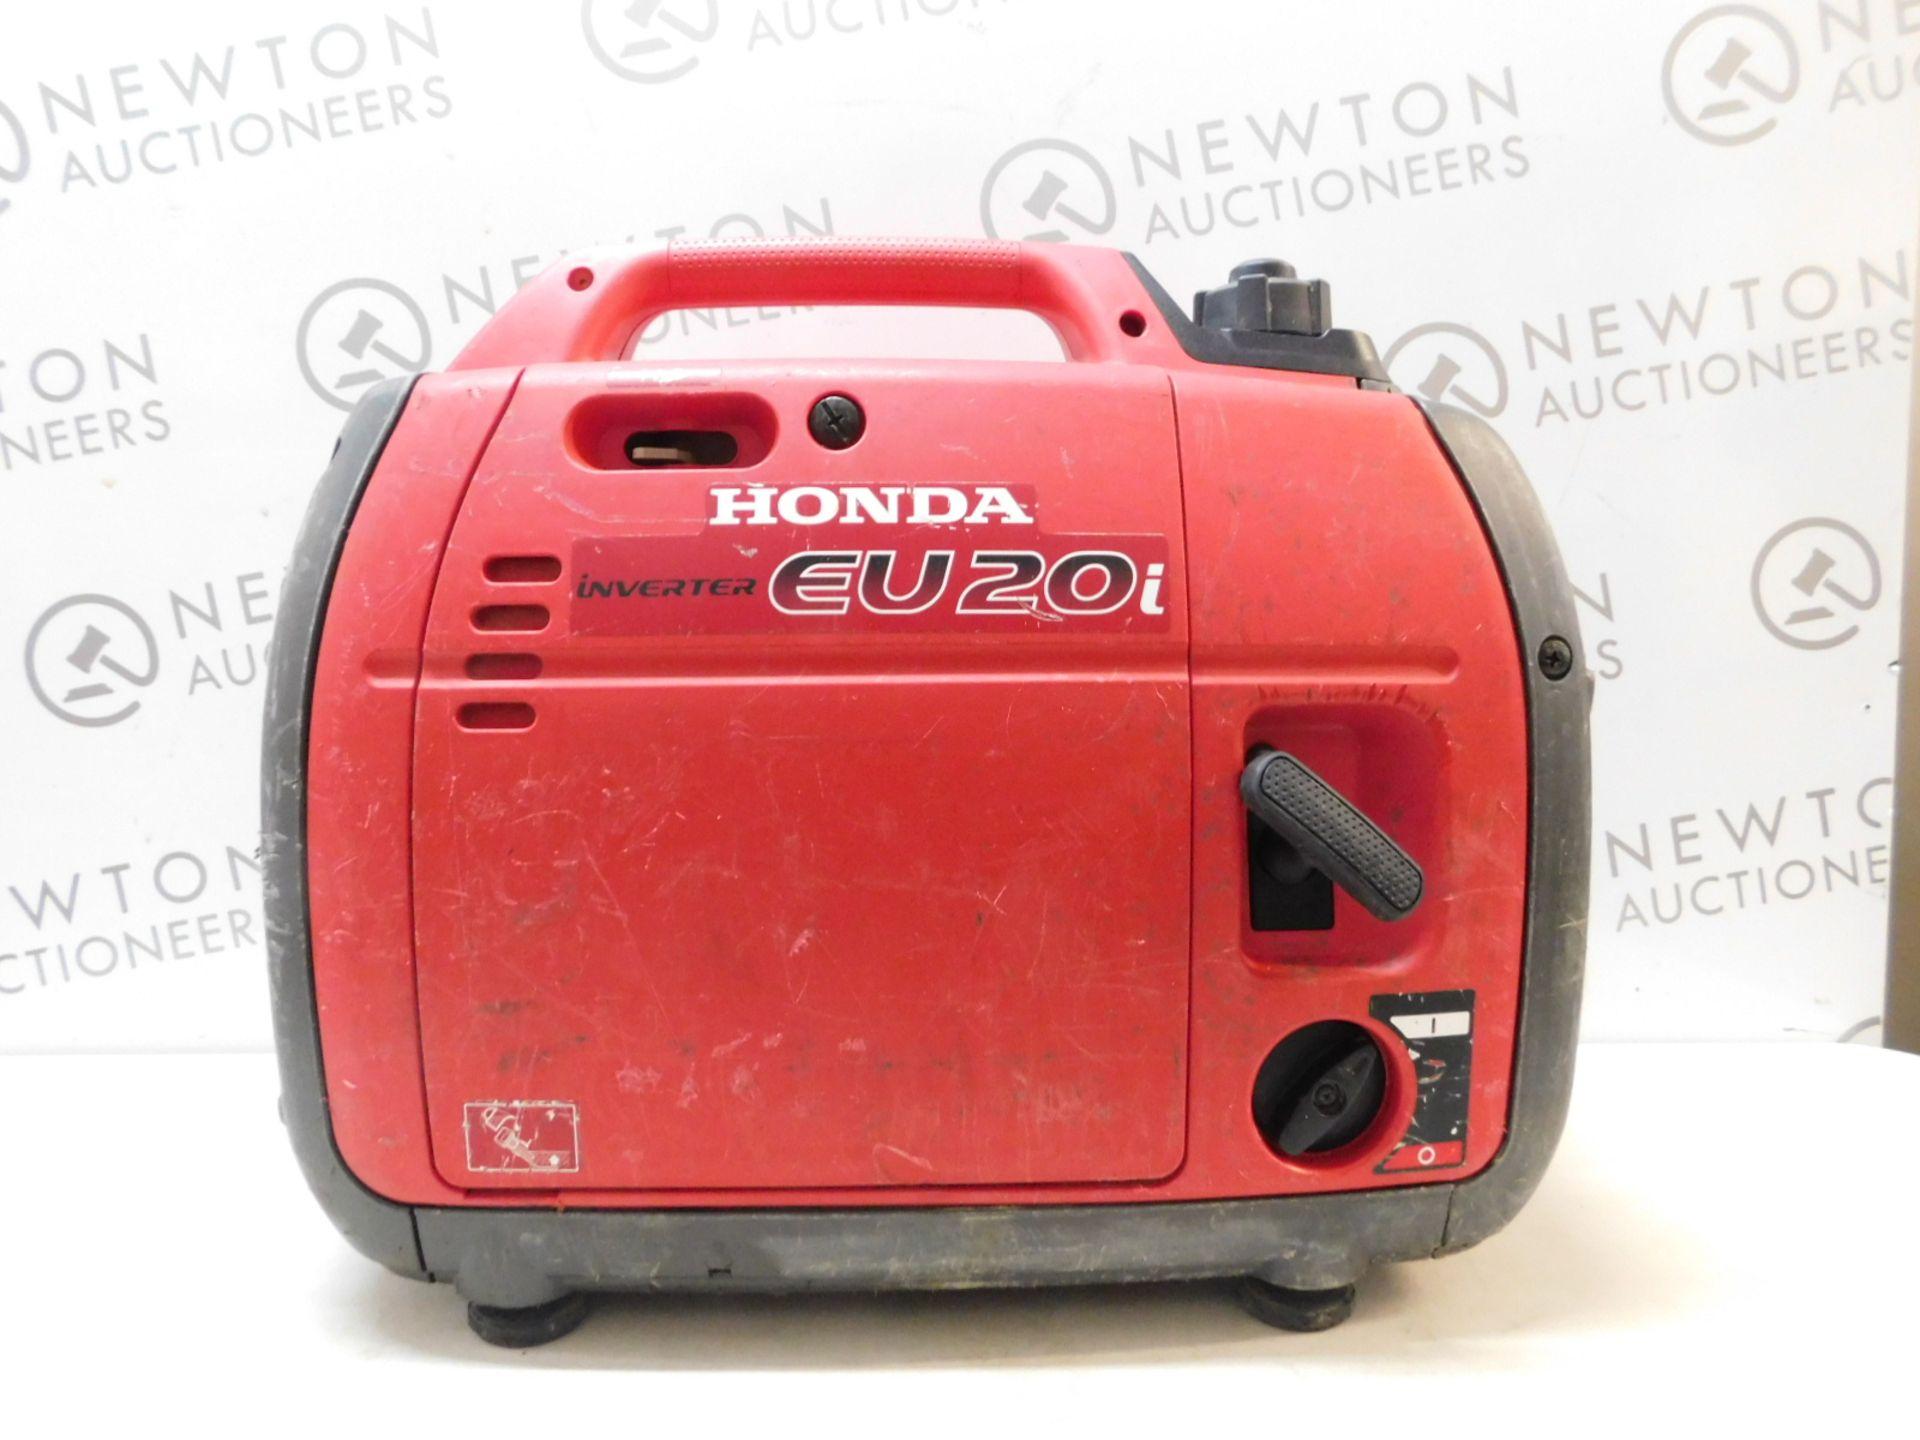 Lot 339 - 1 BOXED HONDA EU20I 1800W PORTABLE GENERATOR RRP £1099